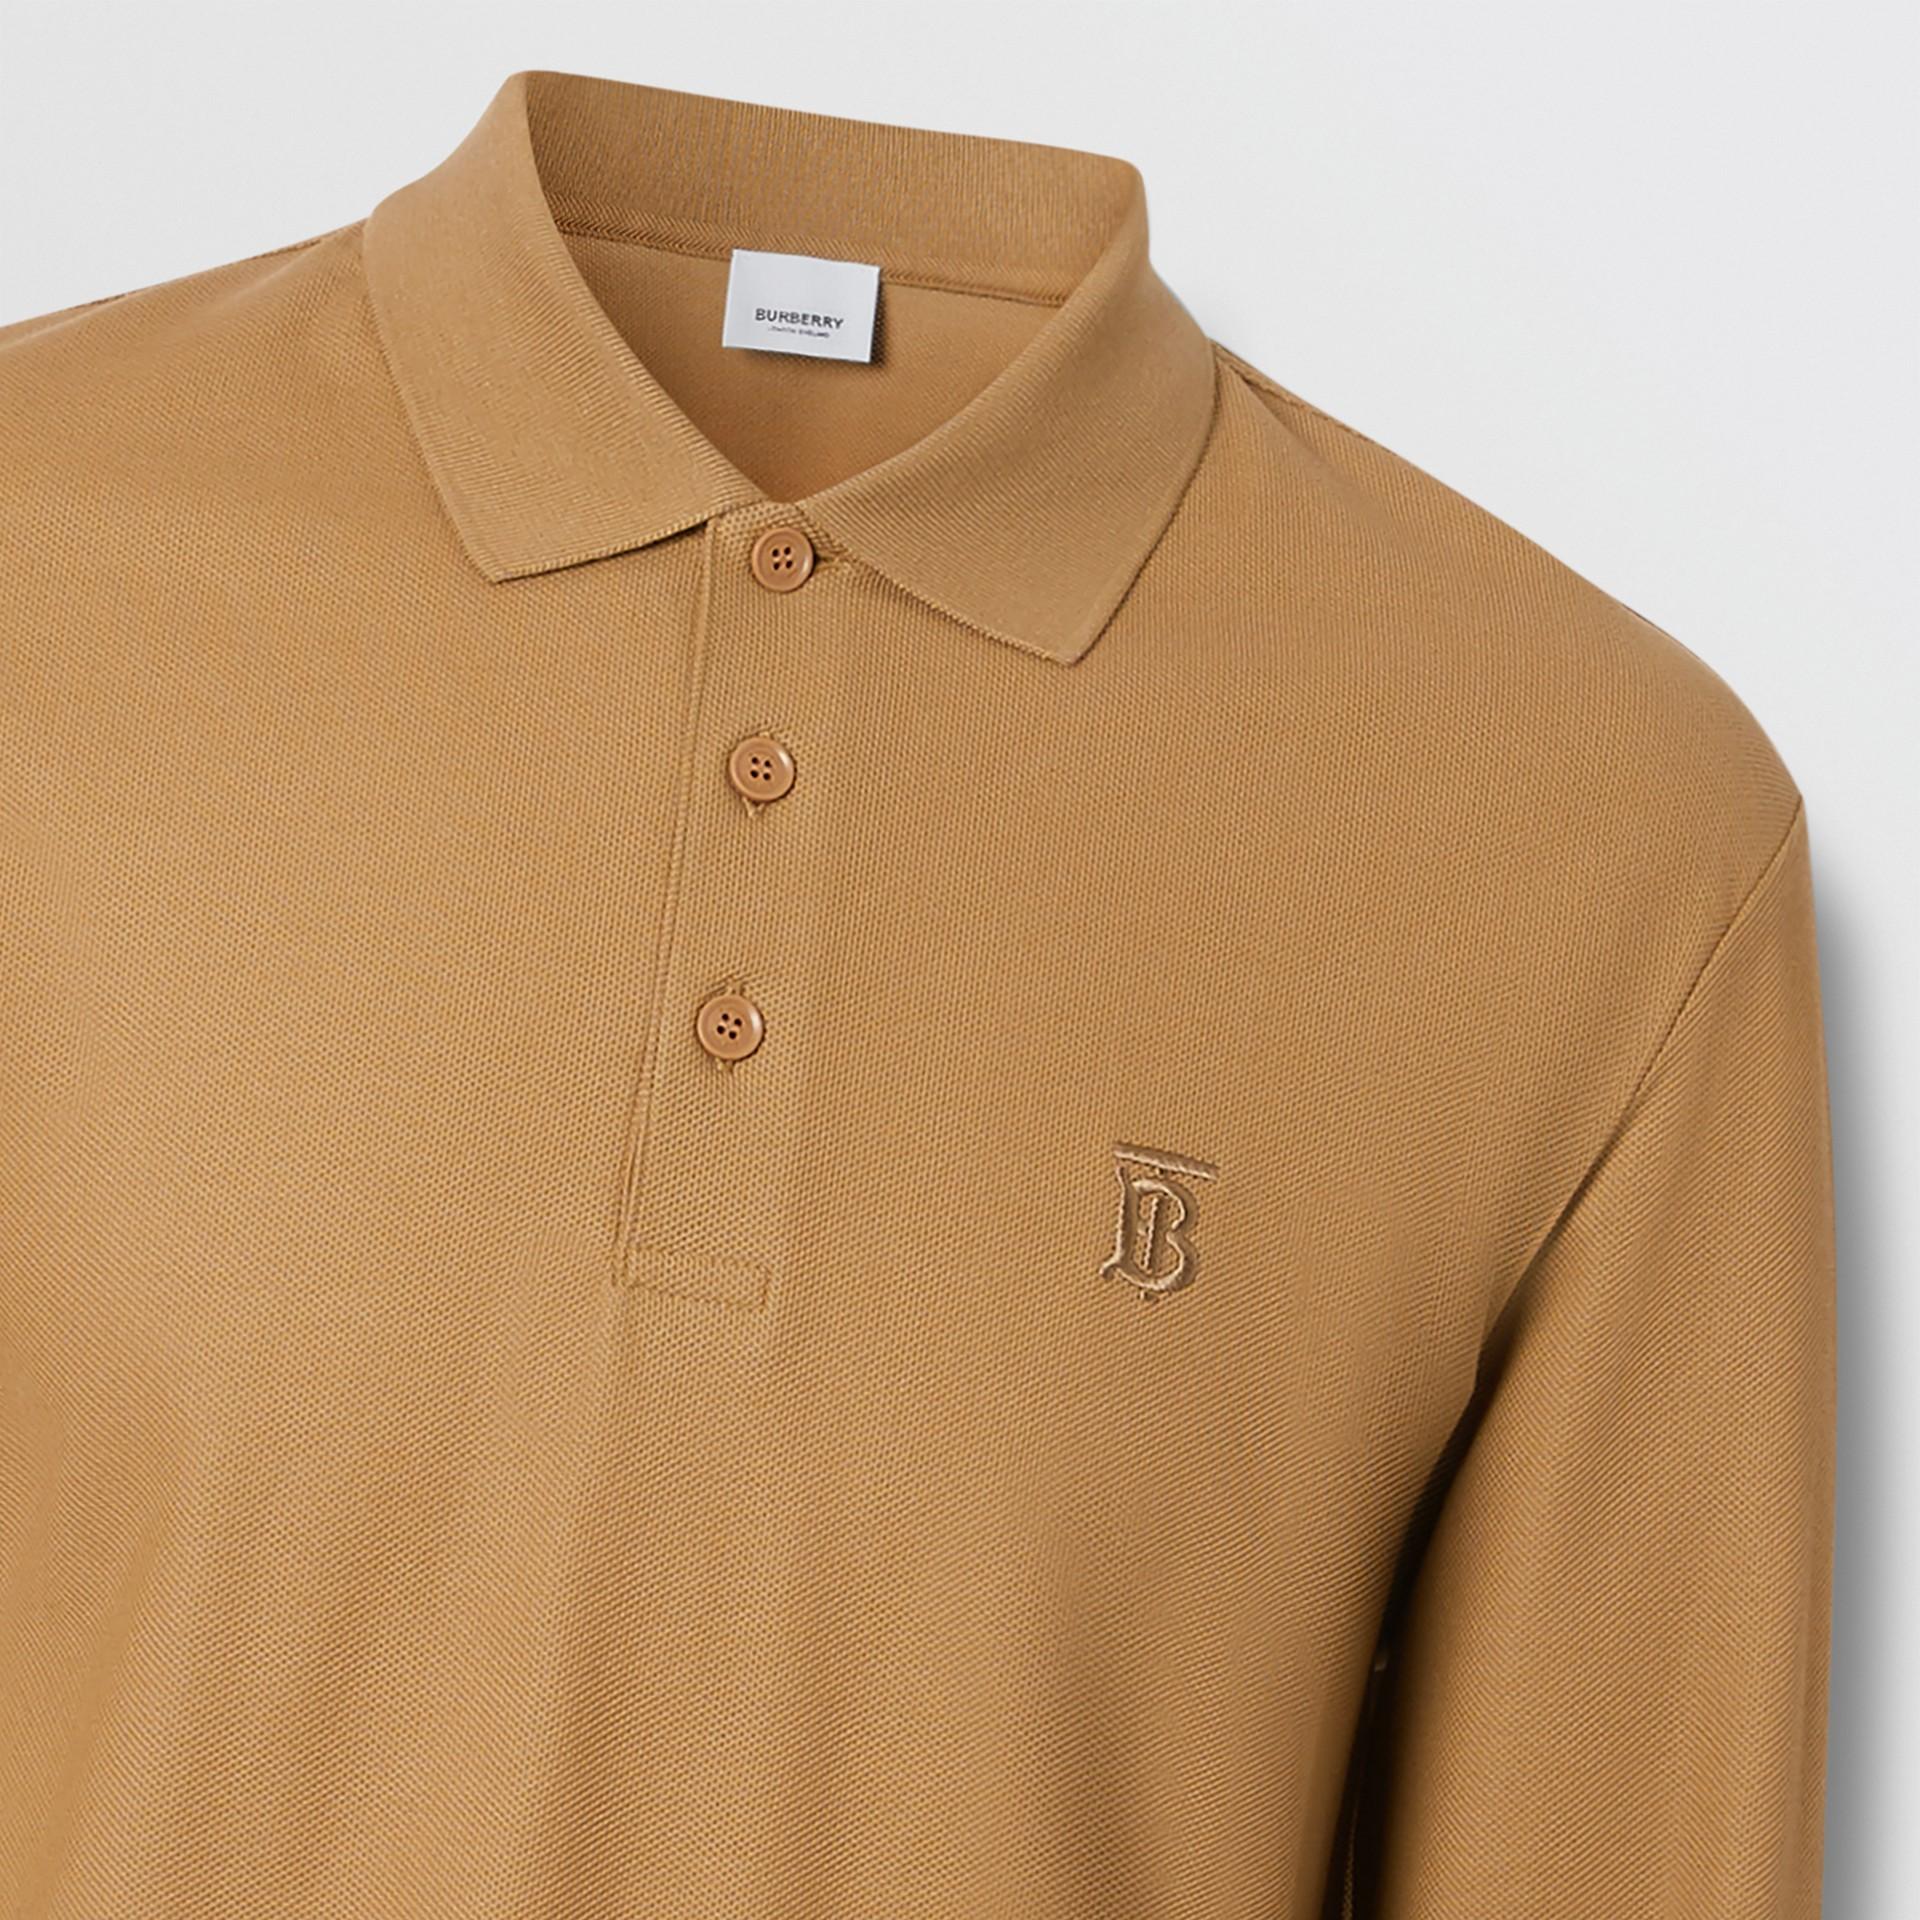 Long-sleeve Monogram Motif Cotton Piqué Polo Shirt in Camel - Men | Burberry United Kingdom - gallery image 1